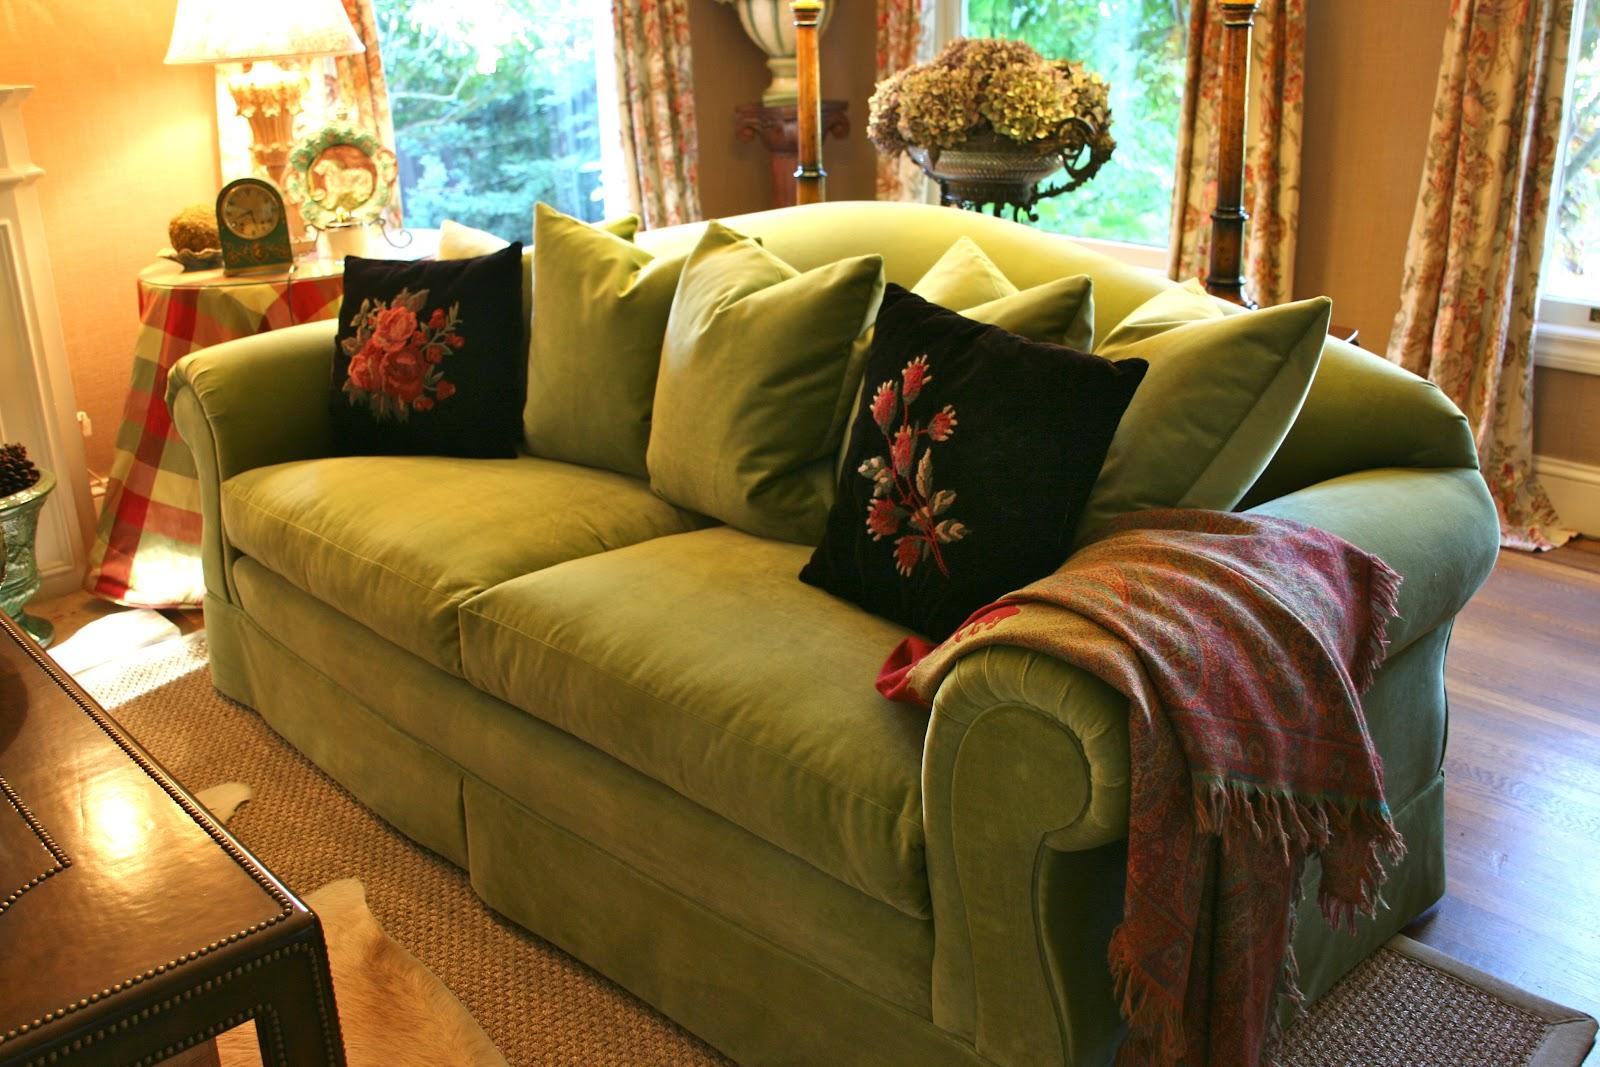 vignette design she wore green velvet. Black Bedroom Furniture Sets. Home Design Ideas